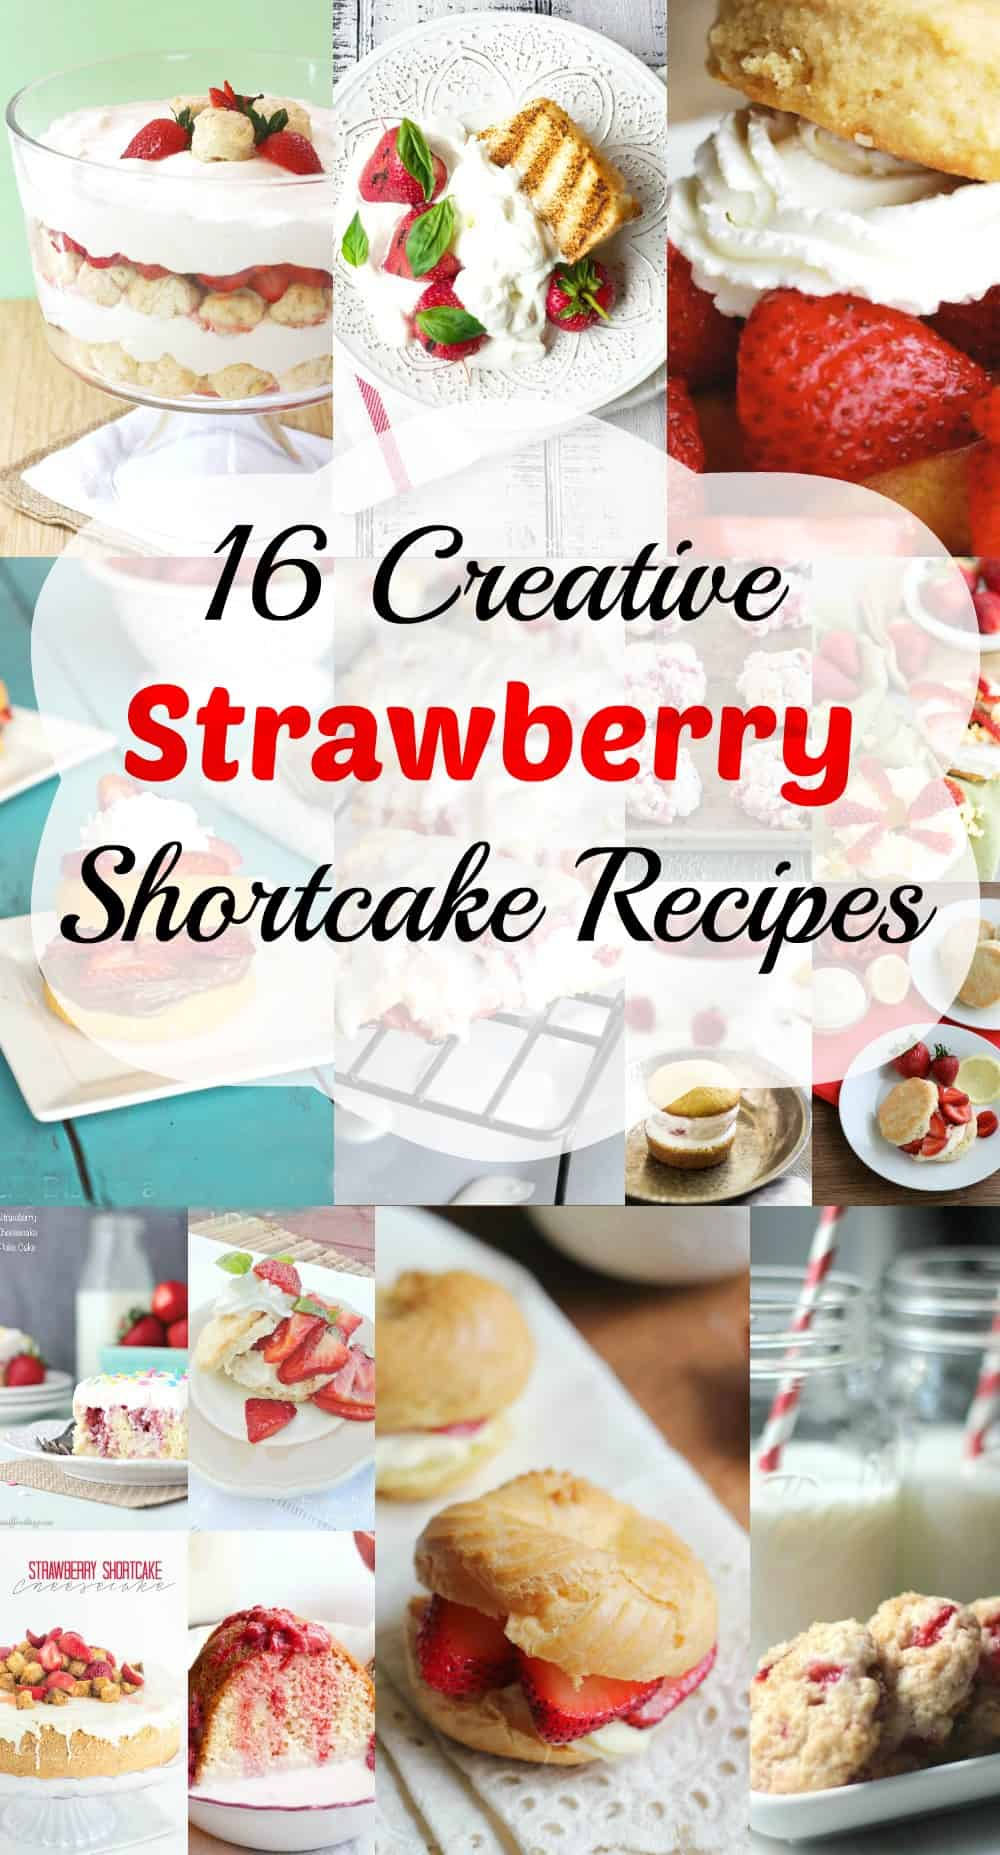 Shrotcake Collage2